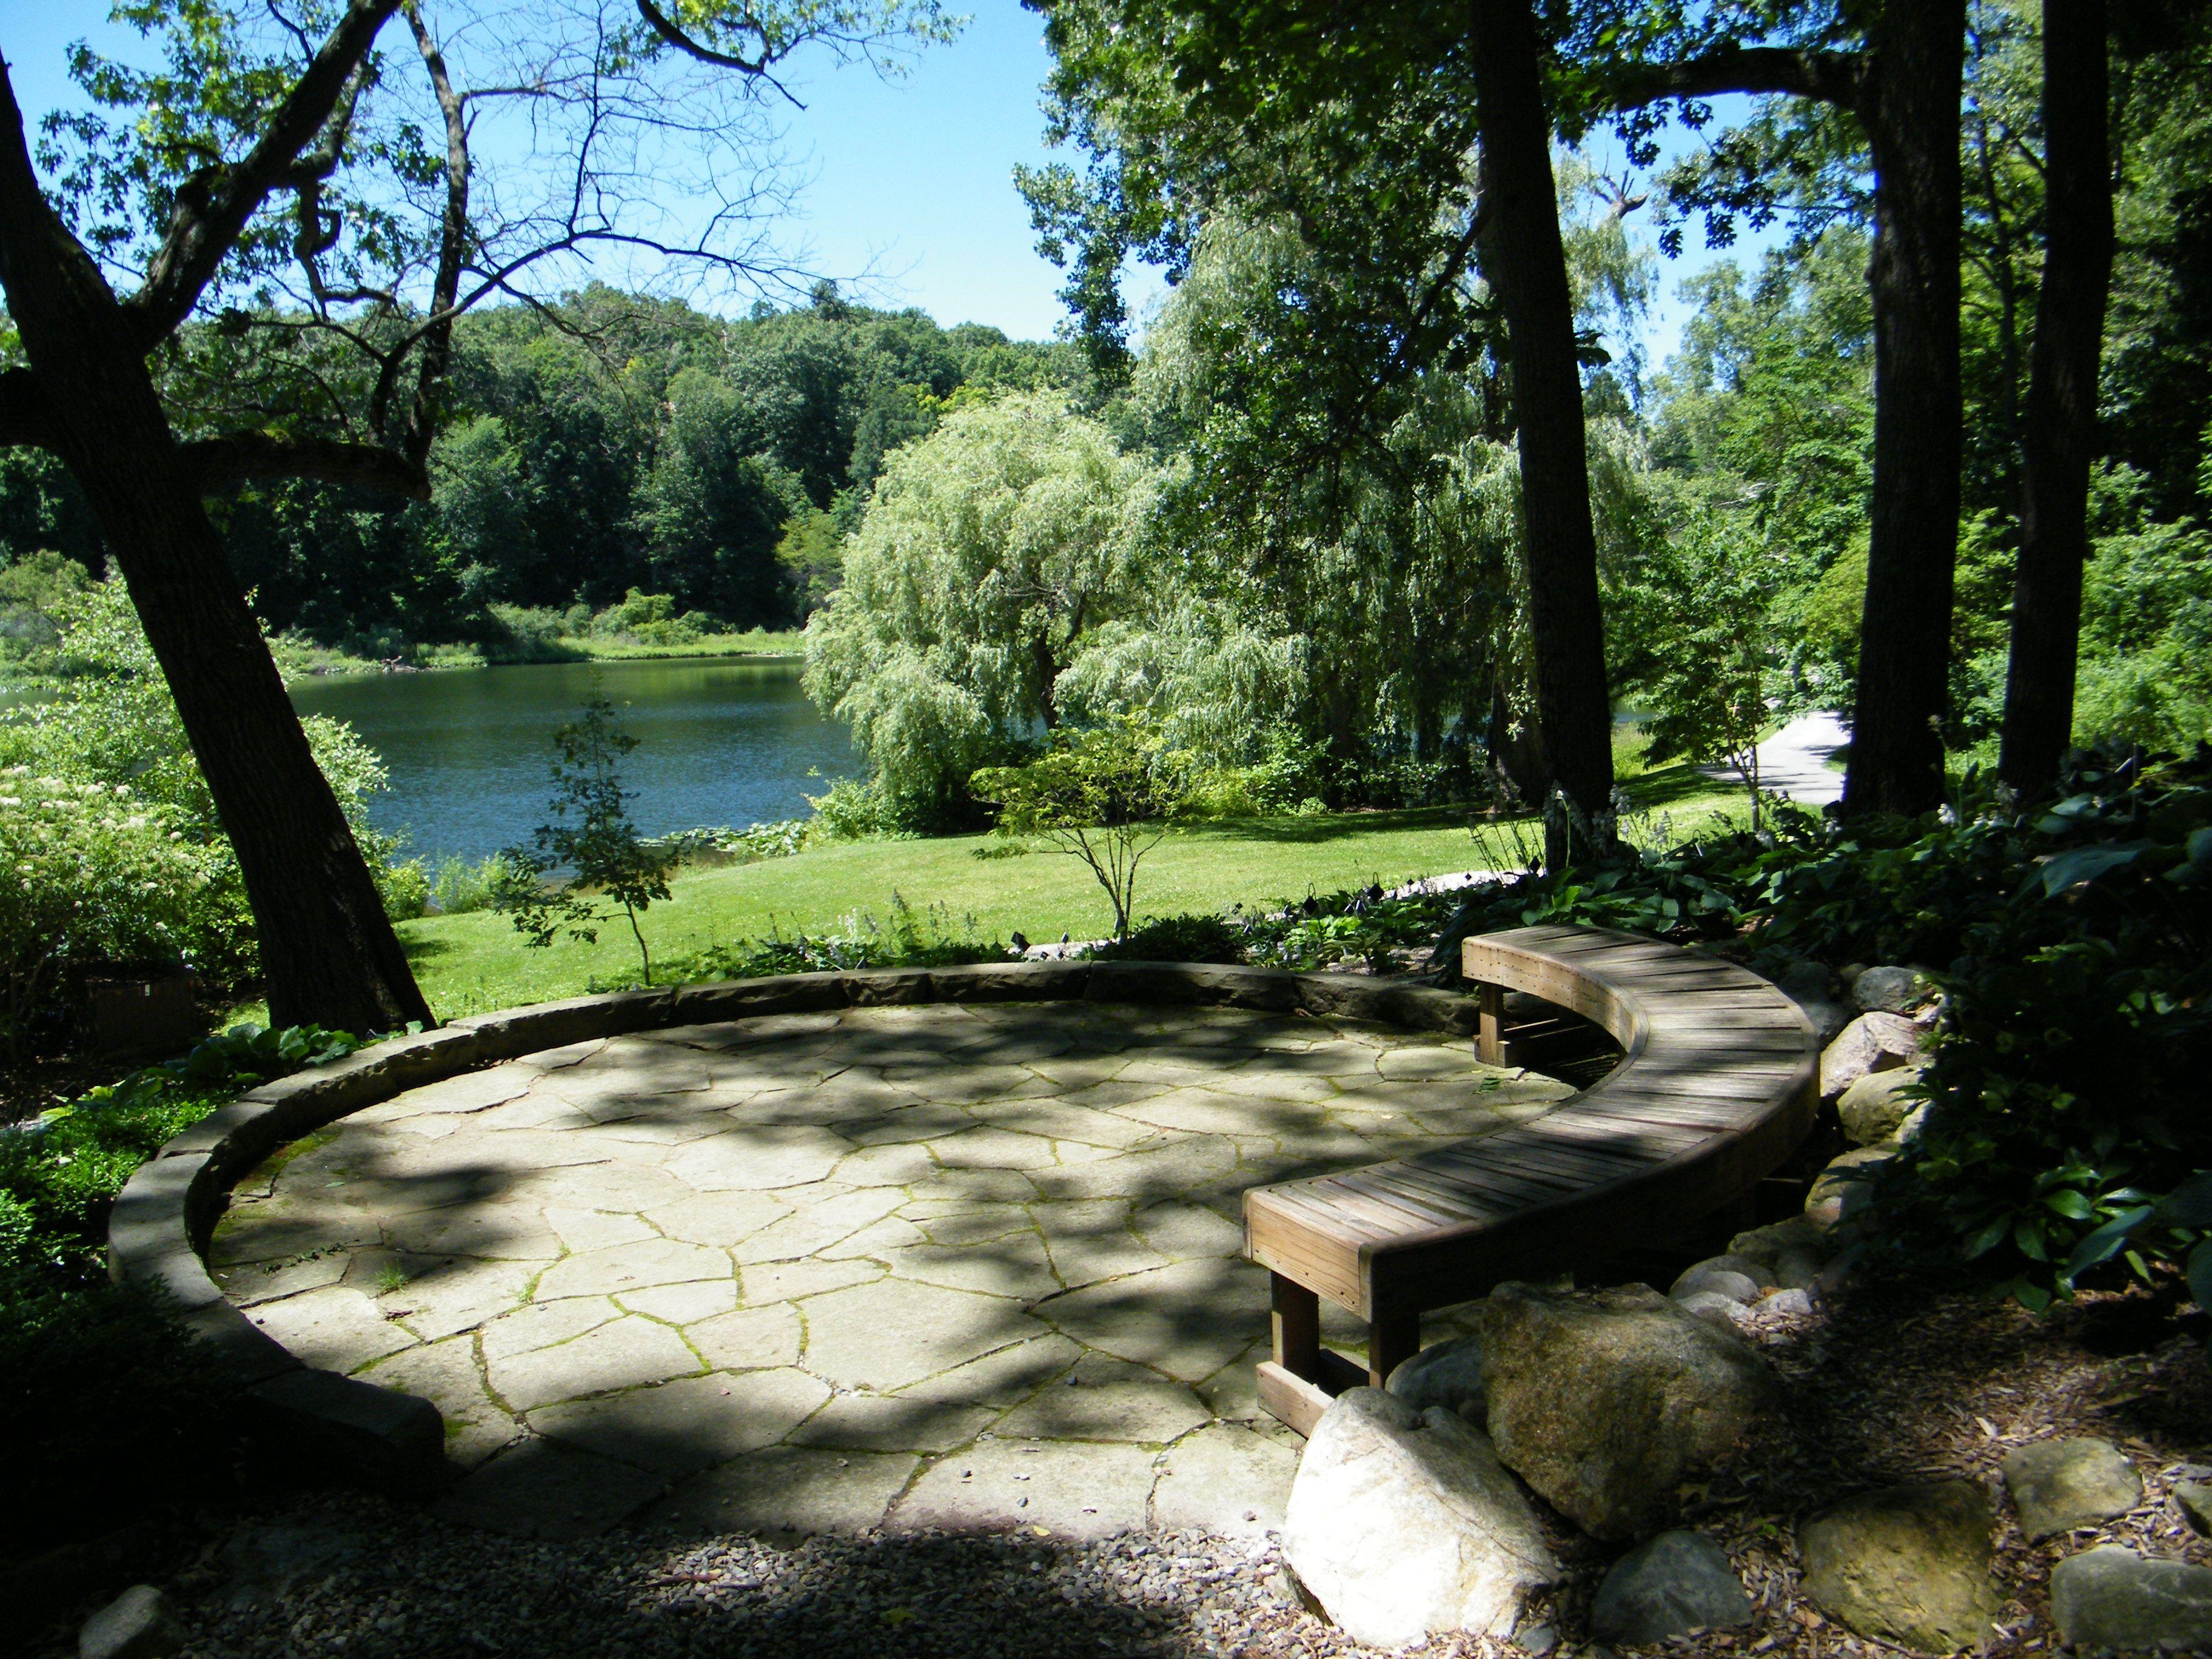 90e58fdc5ce6aa0abd3ff319b4134fa5 - Hidden Lake Gardens In Tipton Michigan